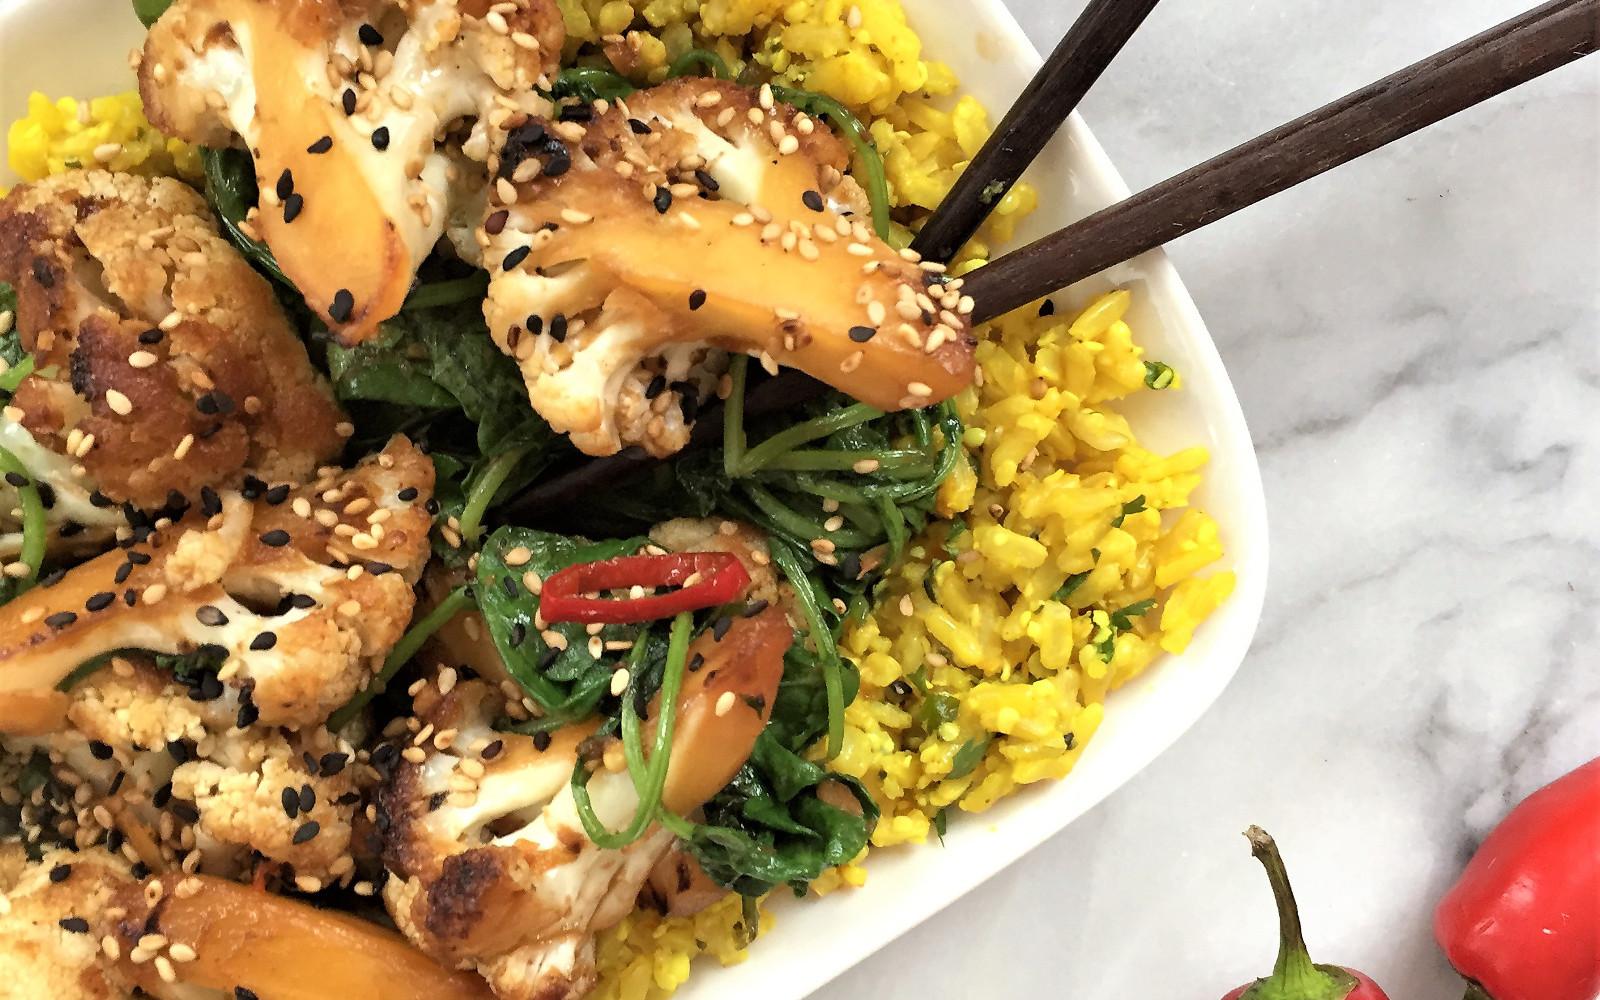 Vegan Gluten-Free Teriyaki Cauliflower and Kale Stir Fry with rice and sesame seeds